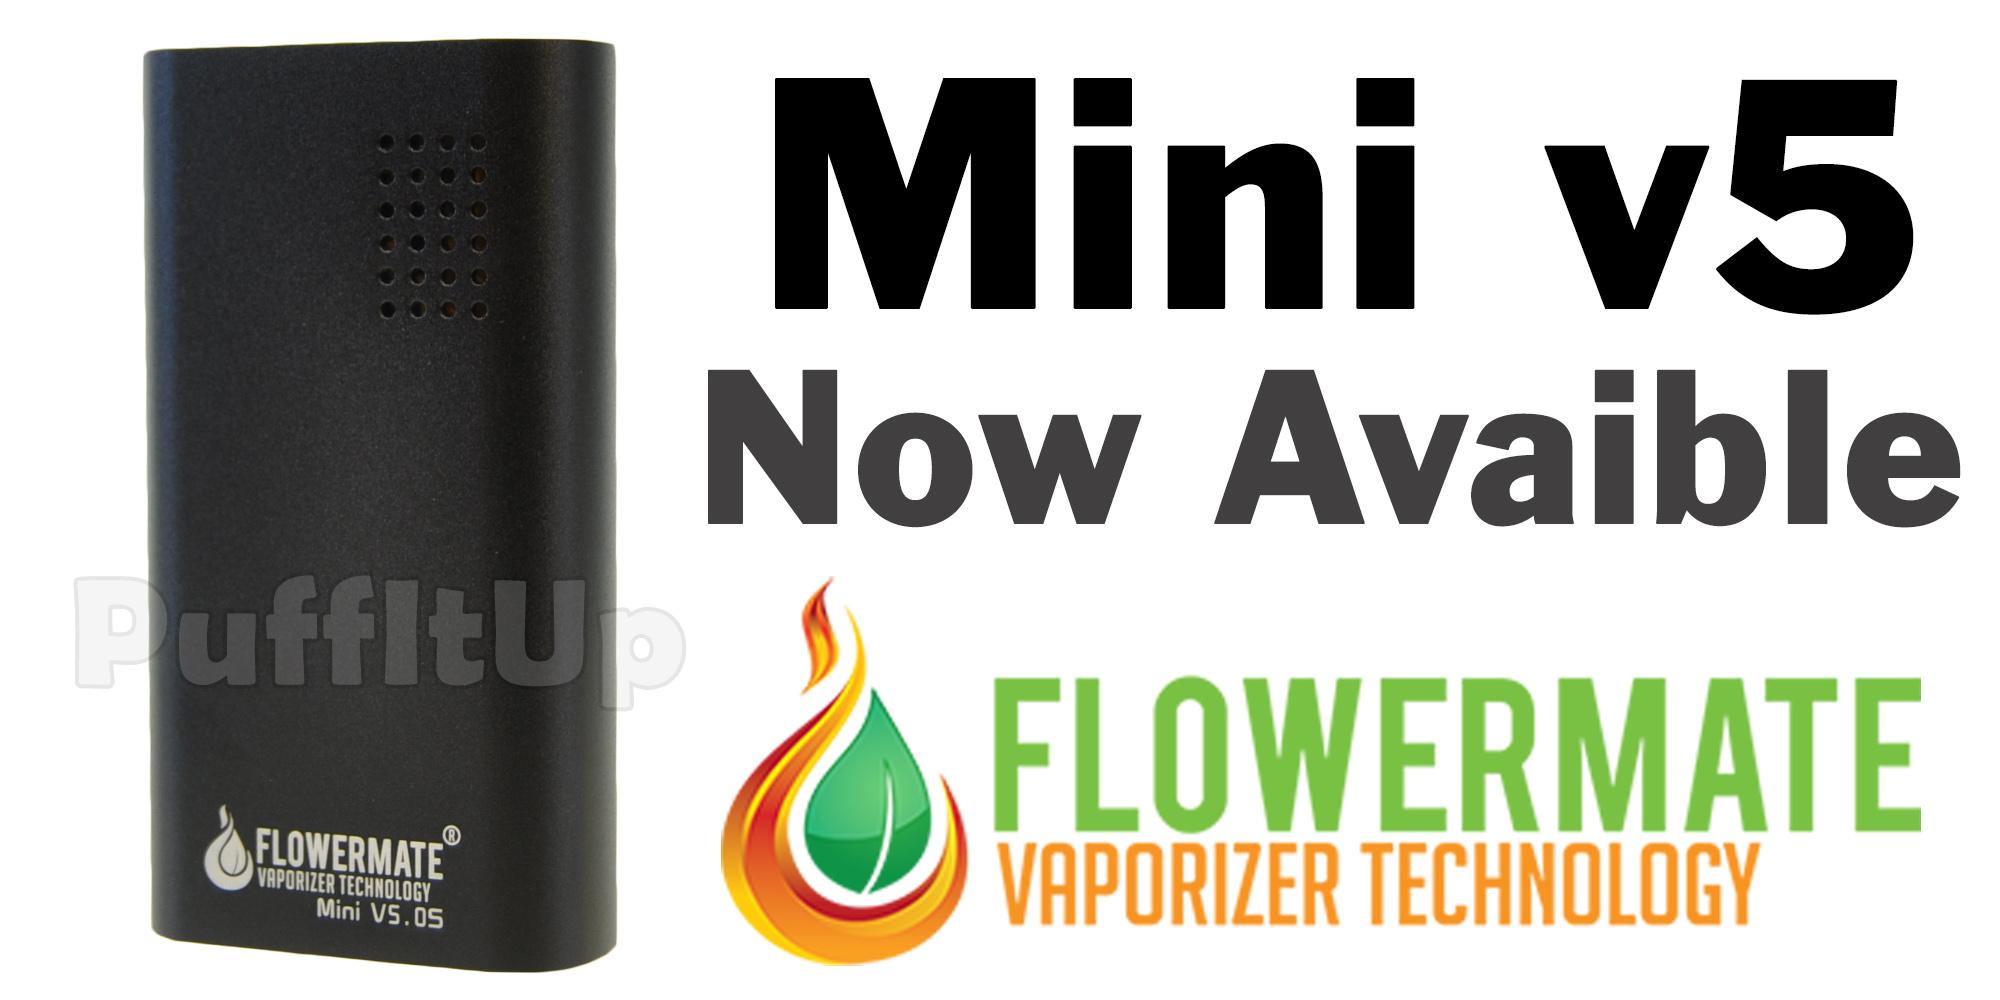 flowermate mini vaporizer